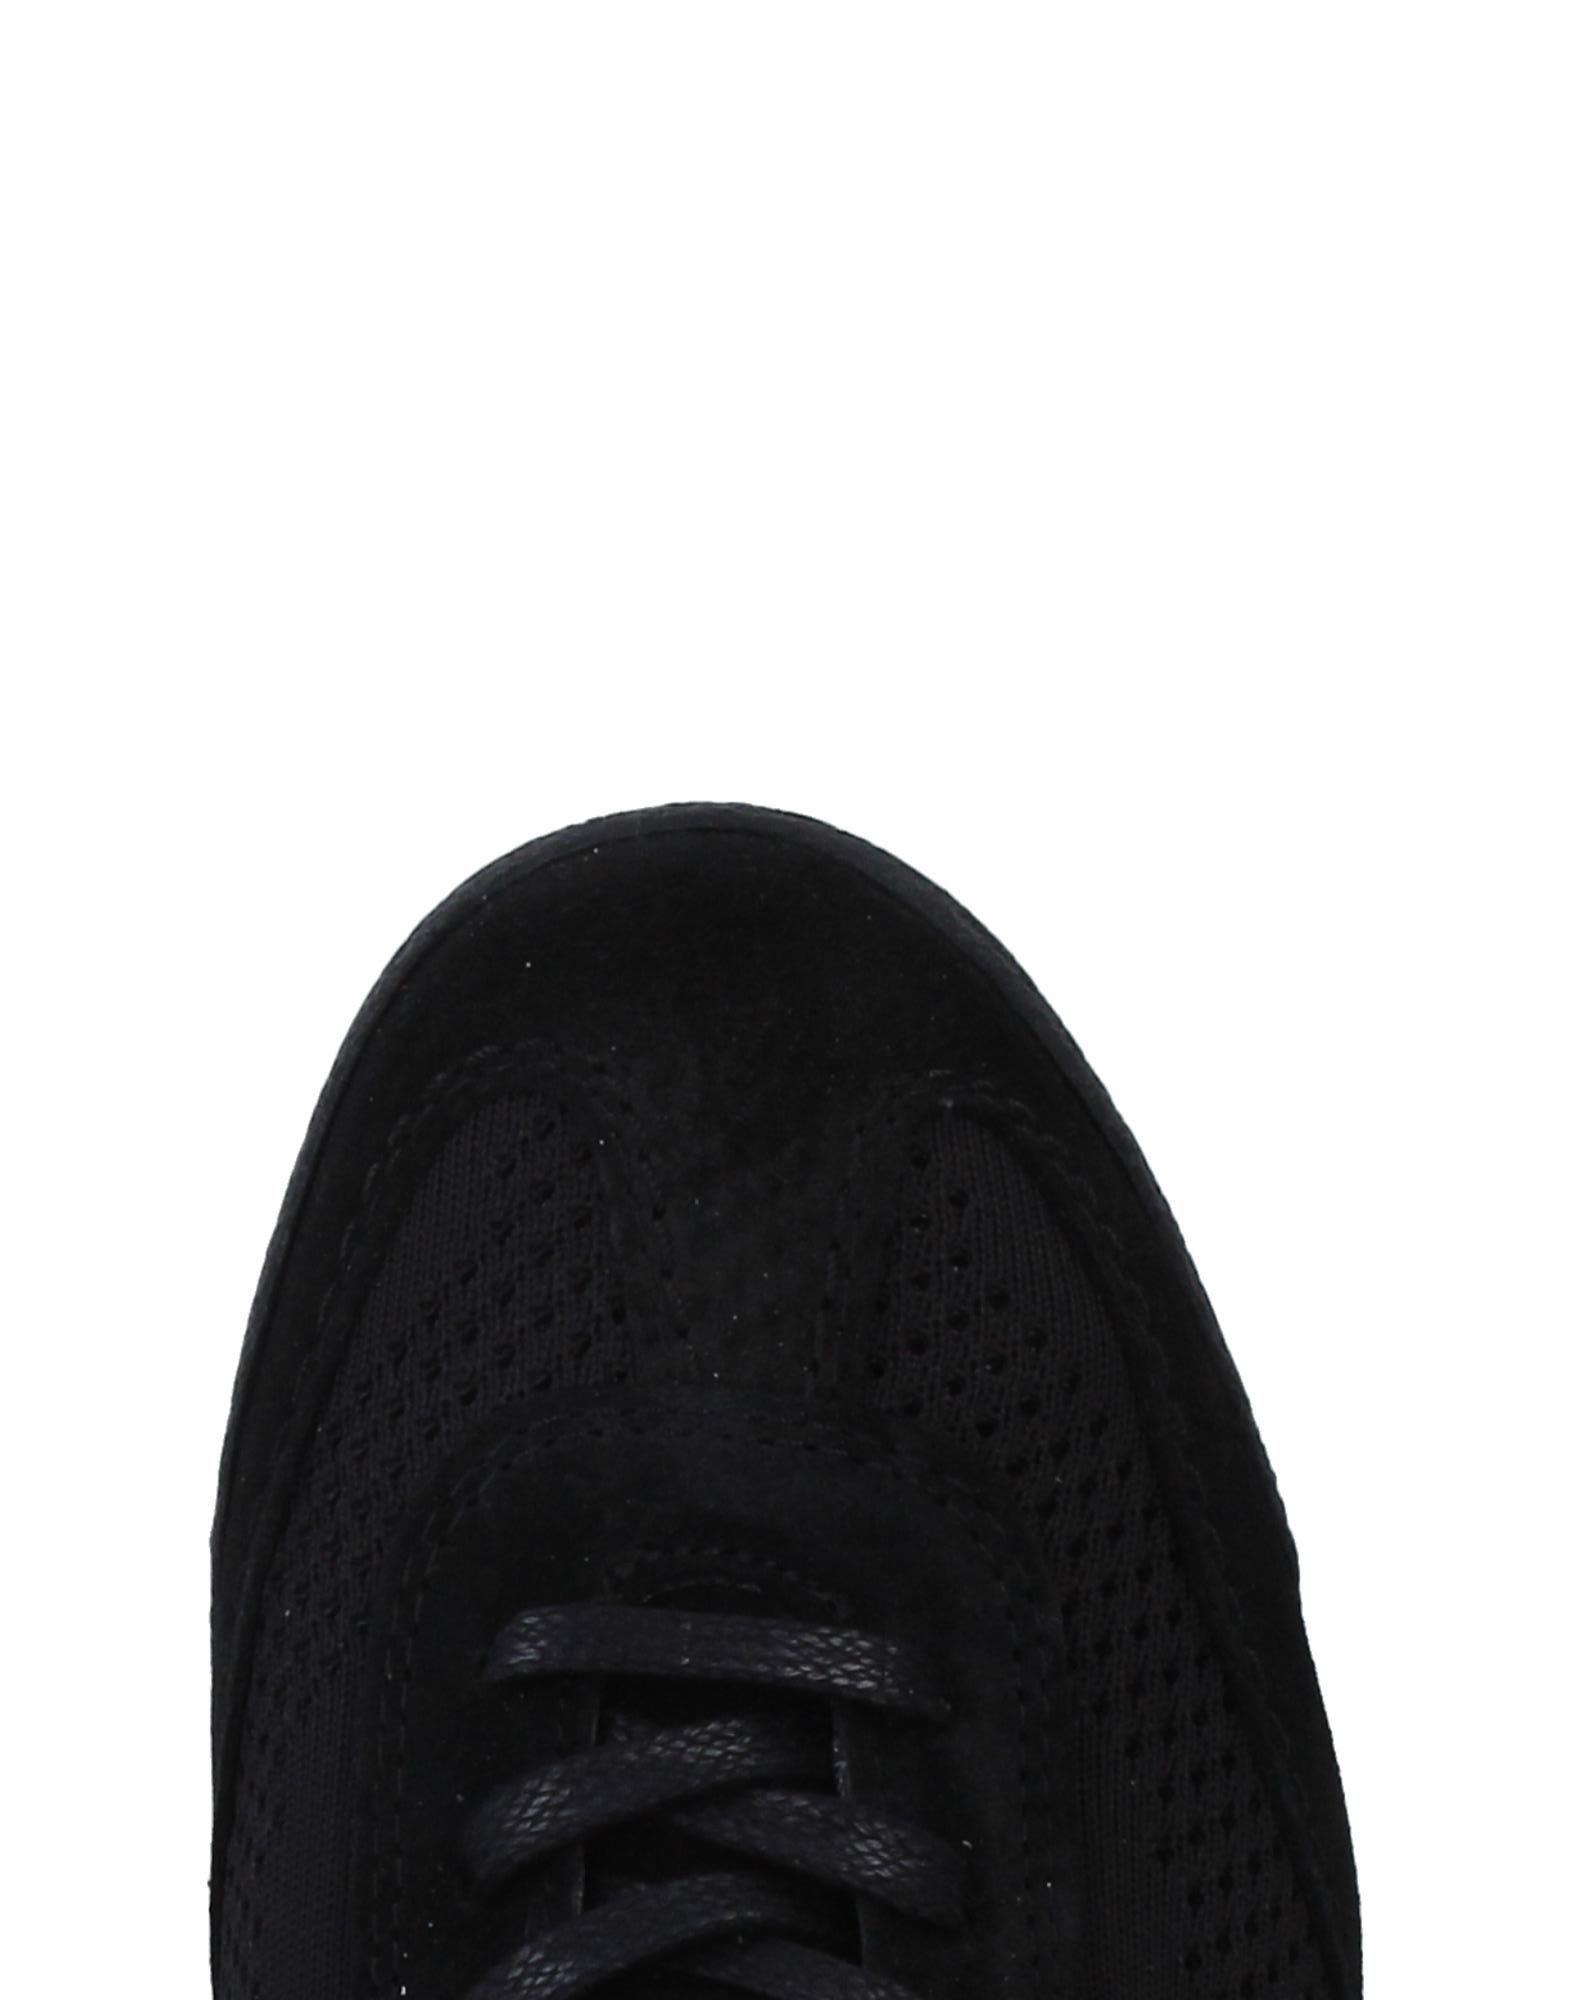 Pantofola D'oro Sneakers Sneakers Sneakers Herren  11338669LV Neue Schuhe 2d828a